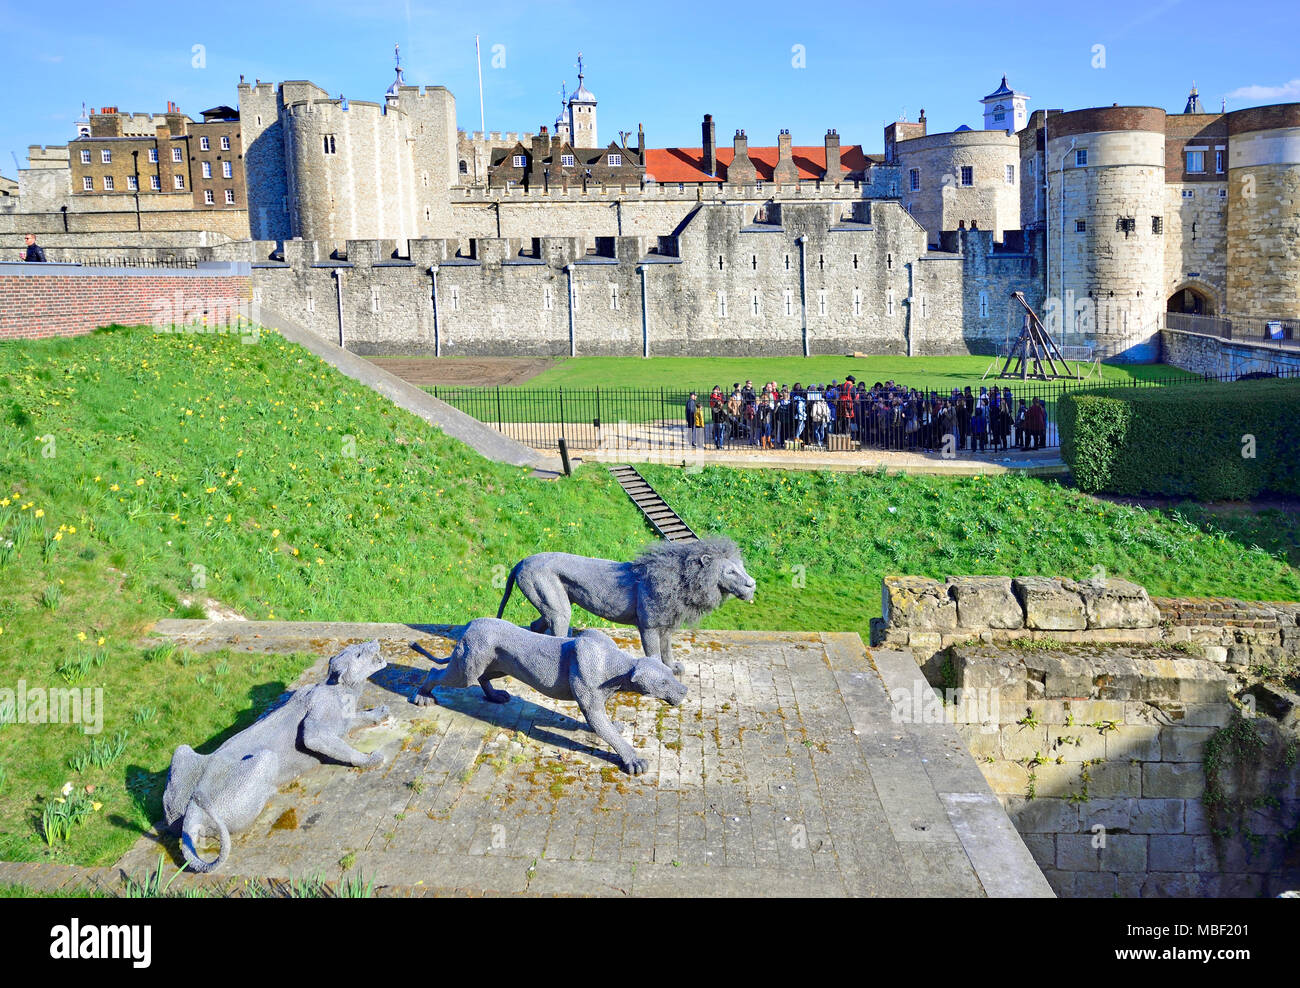 London, England, UK. Tower von London (11.-14 thC) 3 Lions ...